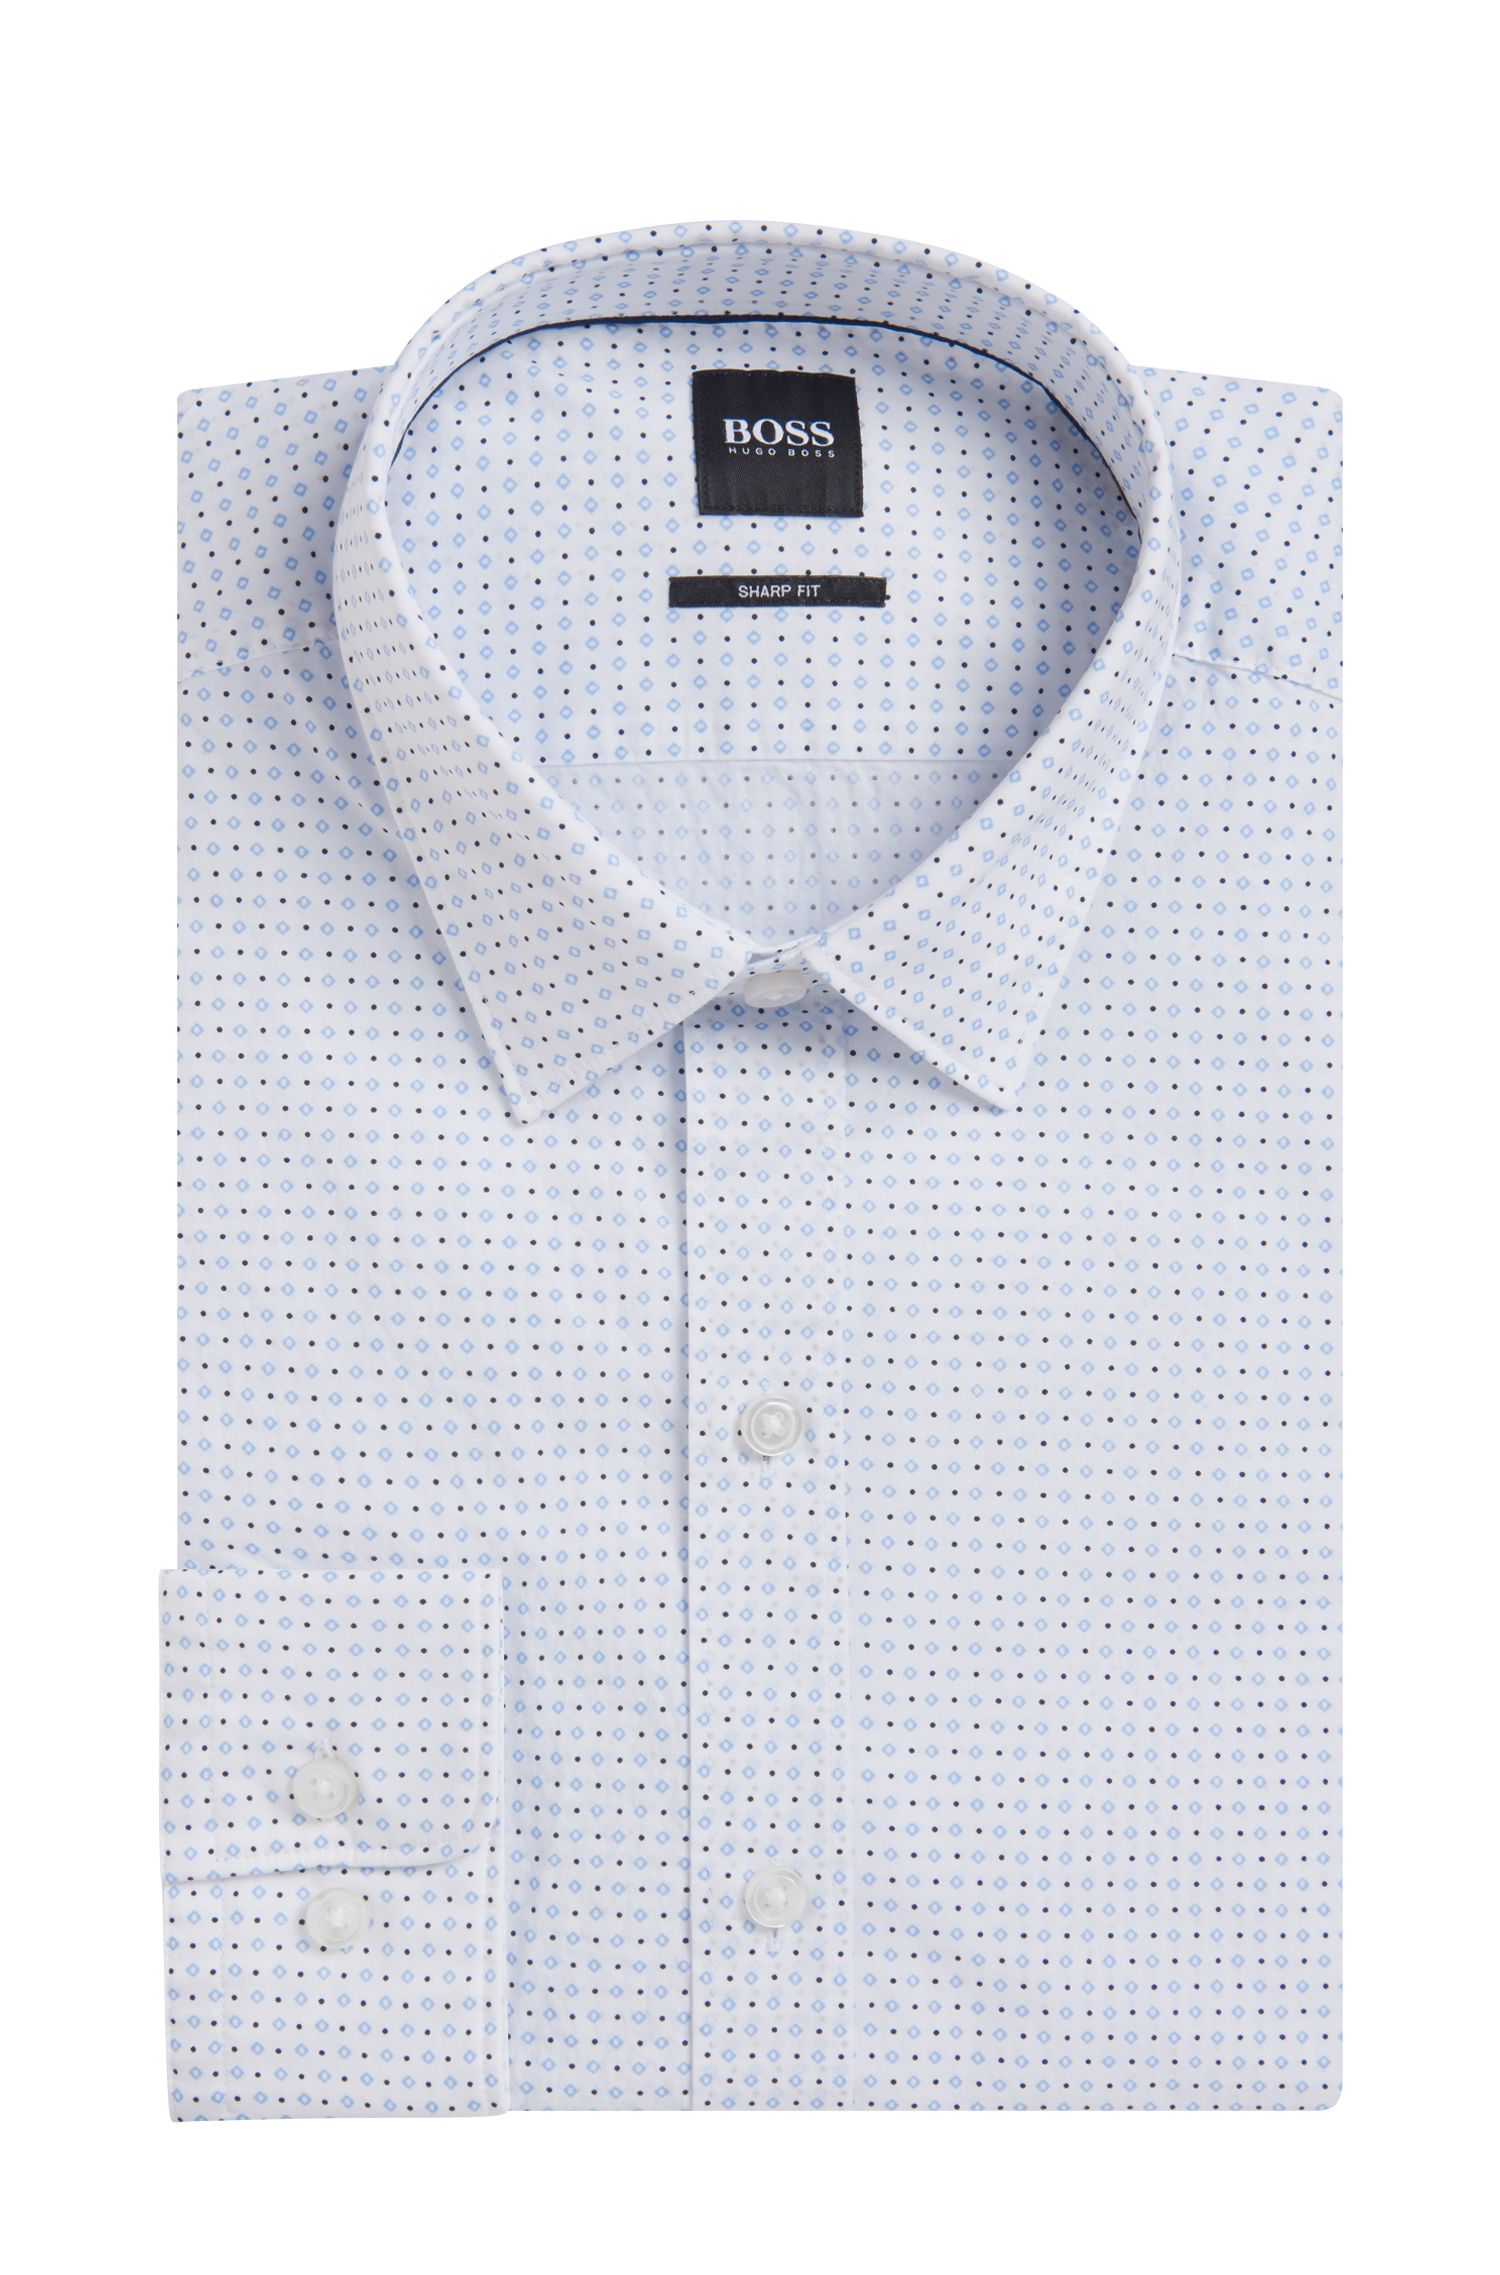 Soft Cotton Shirt, Sharp Fit | Robbie, Light Blue